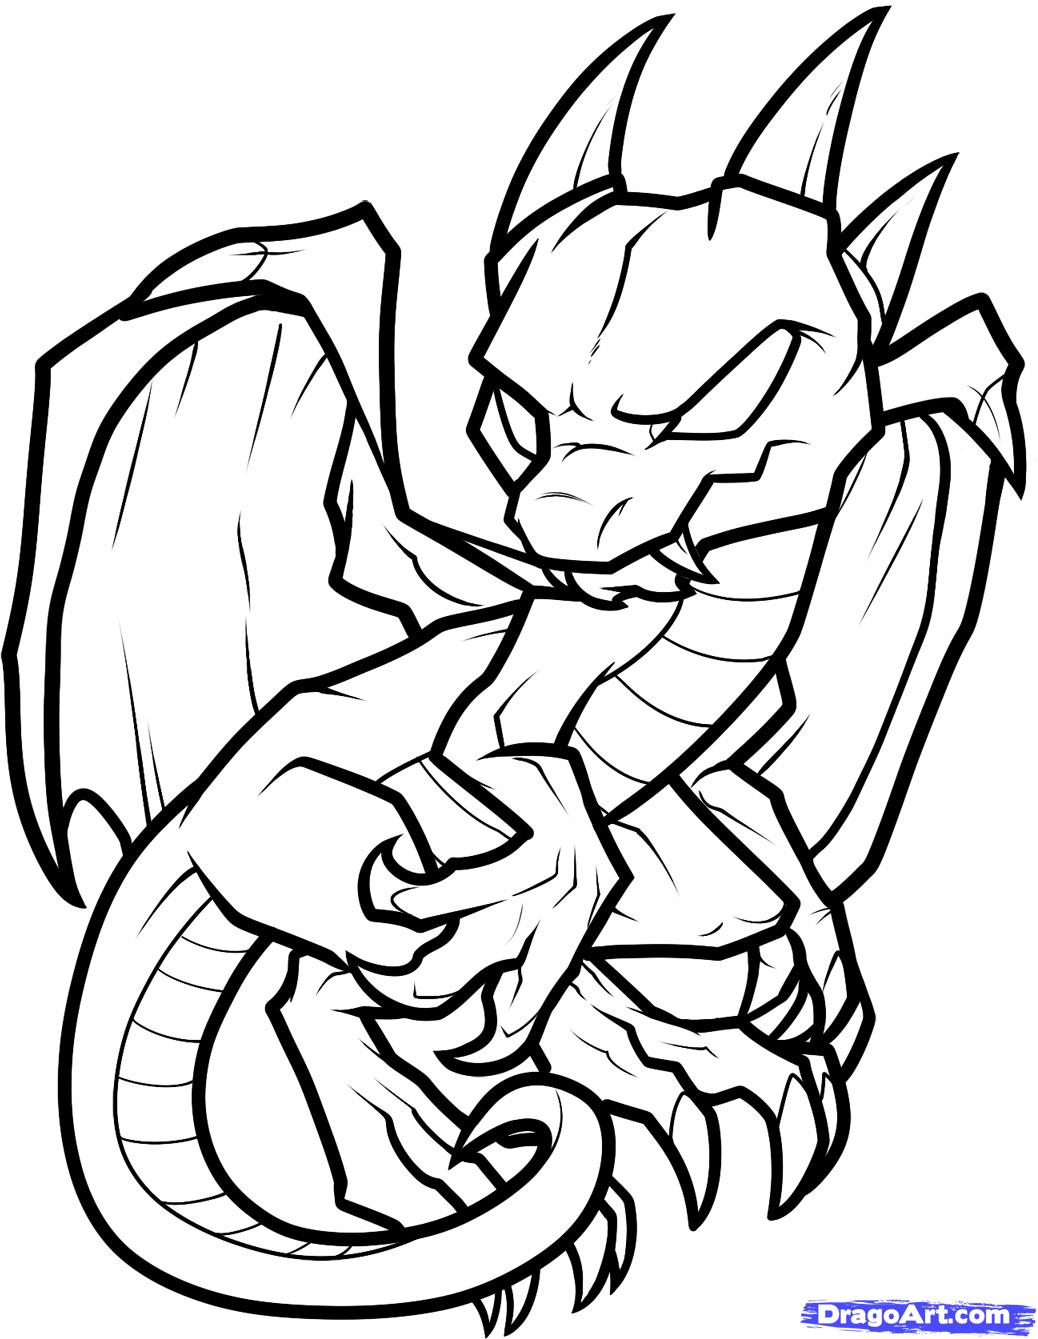 1038x1339 Drawn Dragon Dragoart